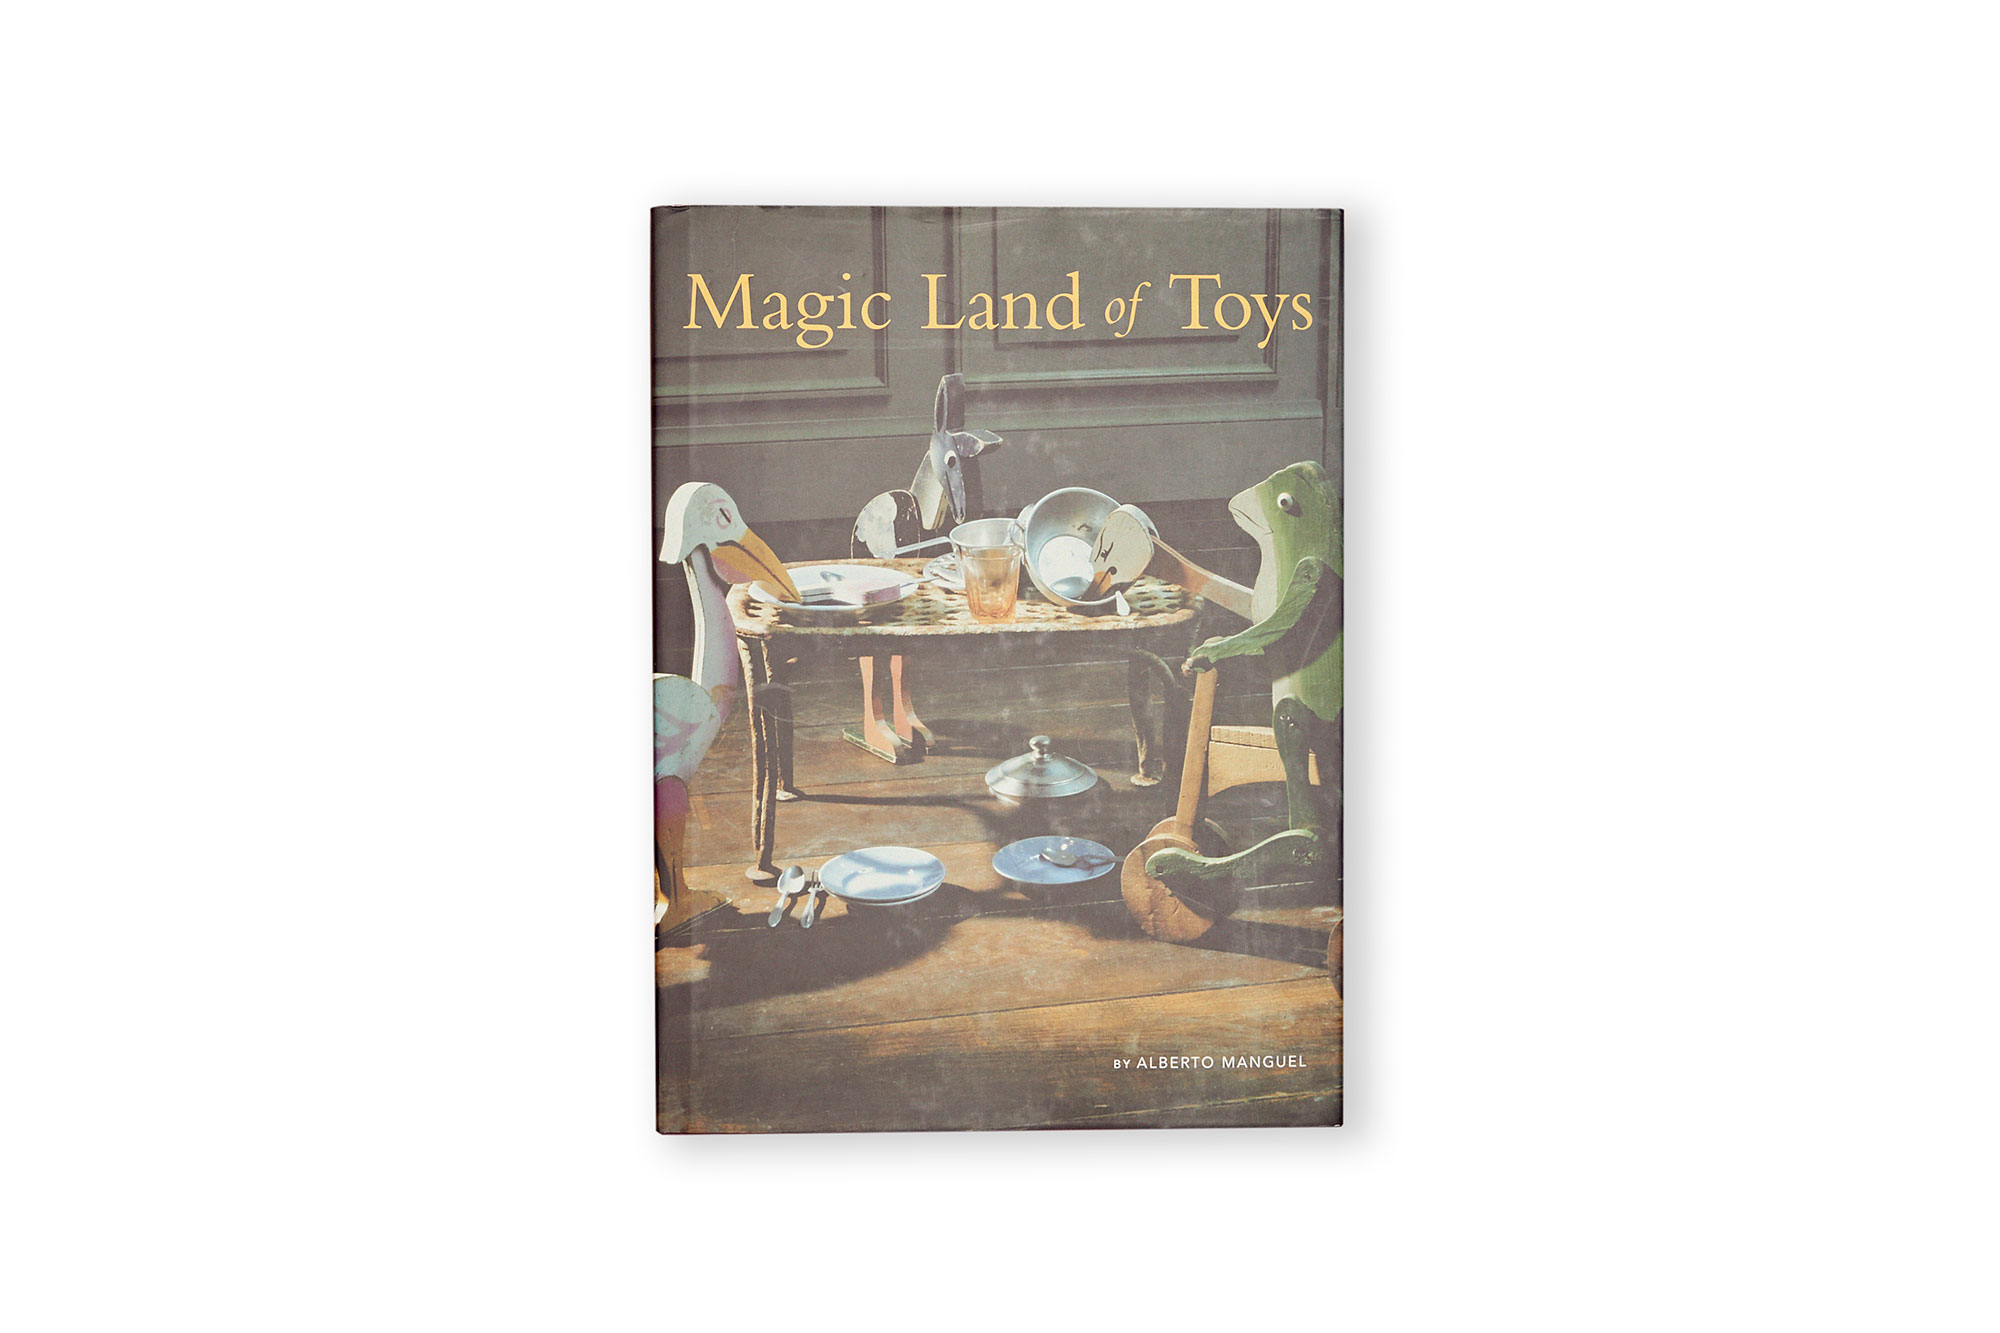 MAGIC LAND OF TOYS, alberto manguel.